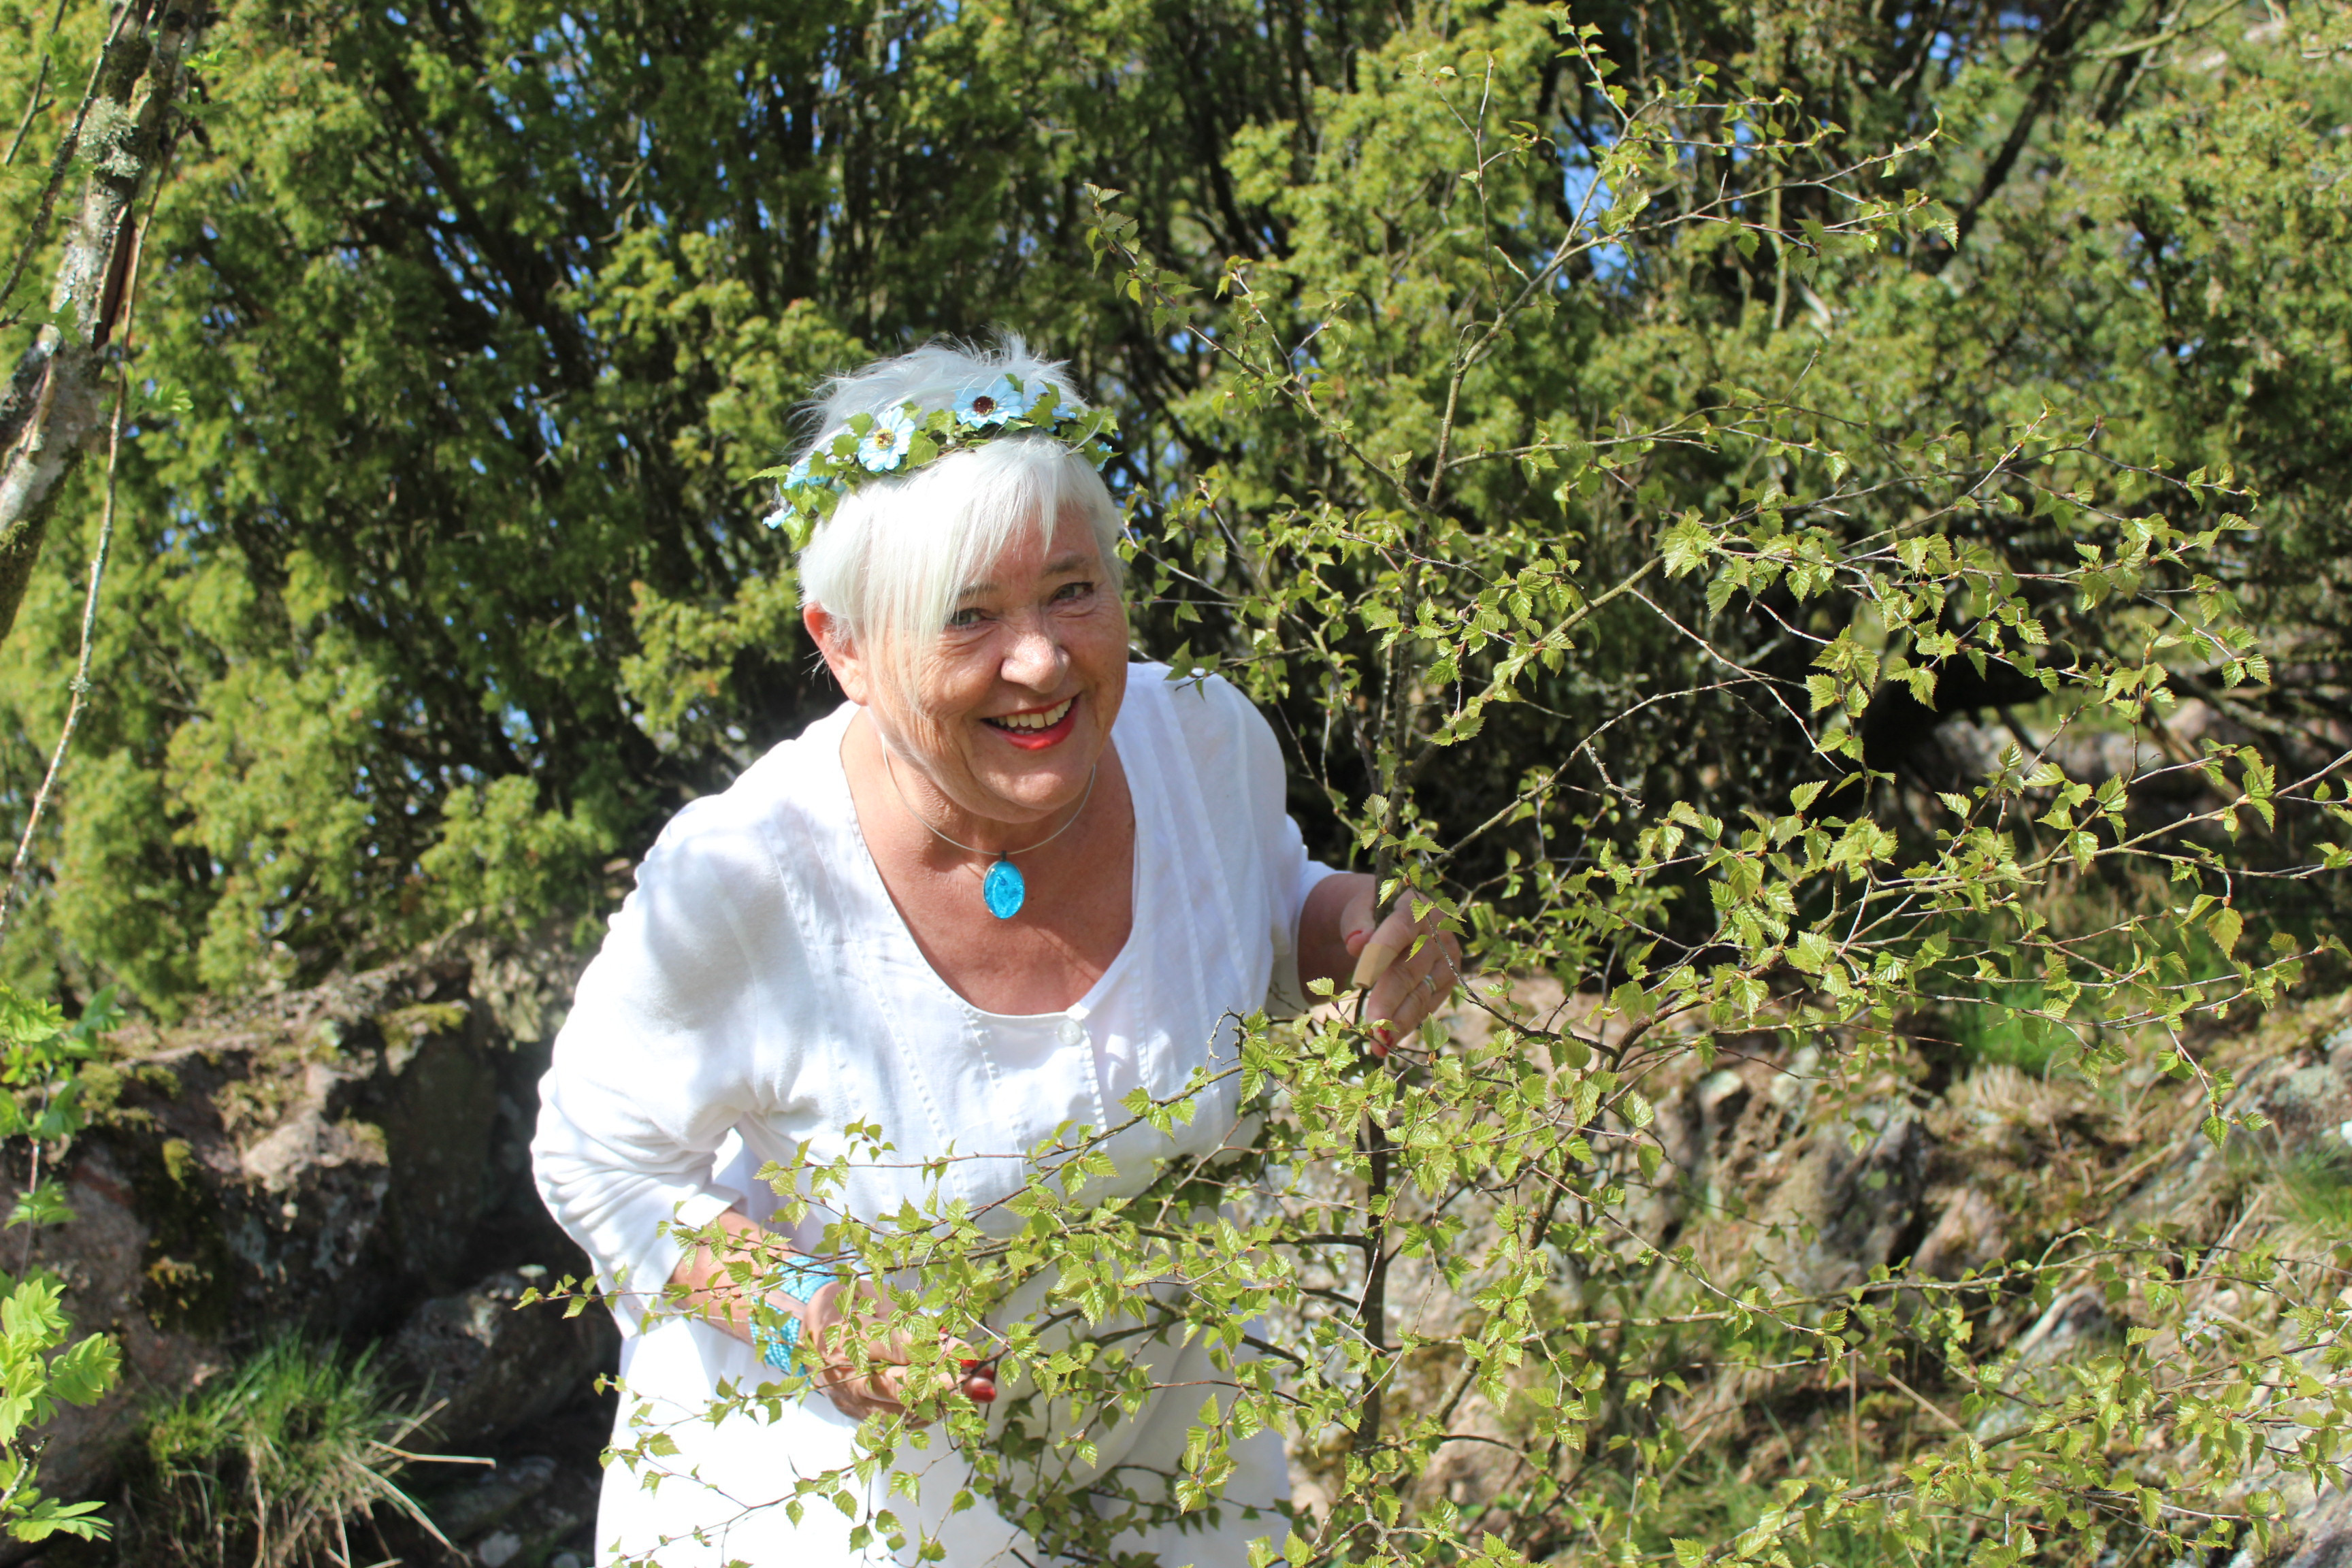 Succeér skall göras om! Singeleventfixaren Helen Andersson ordnar populära midsommarevent!